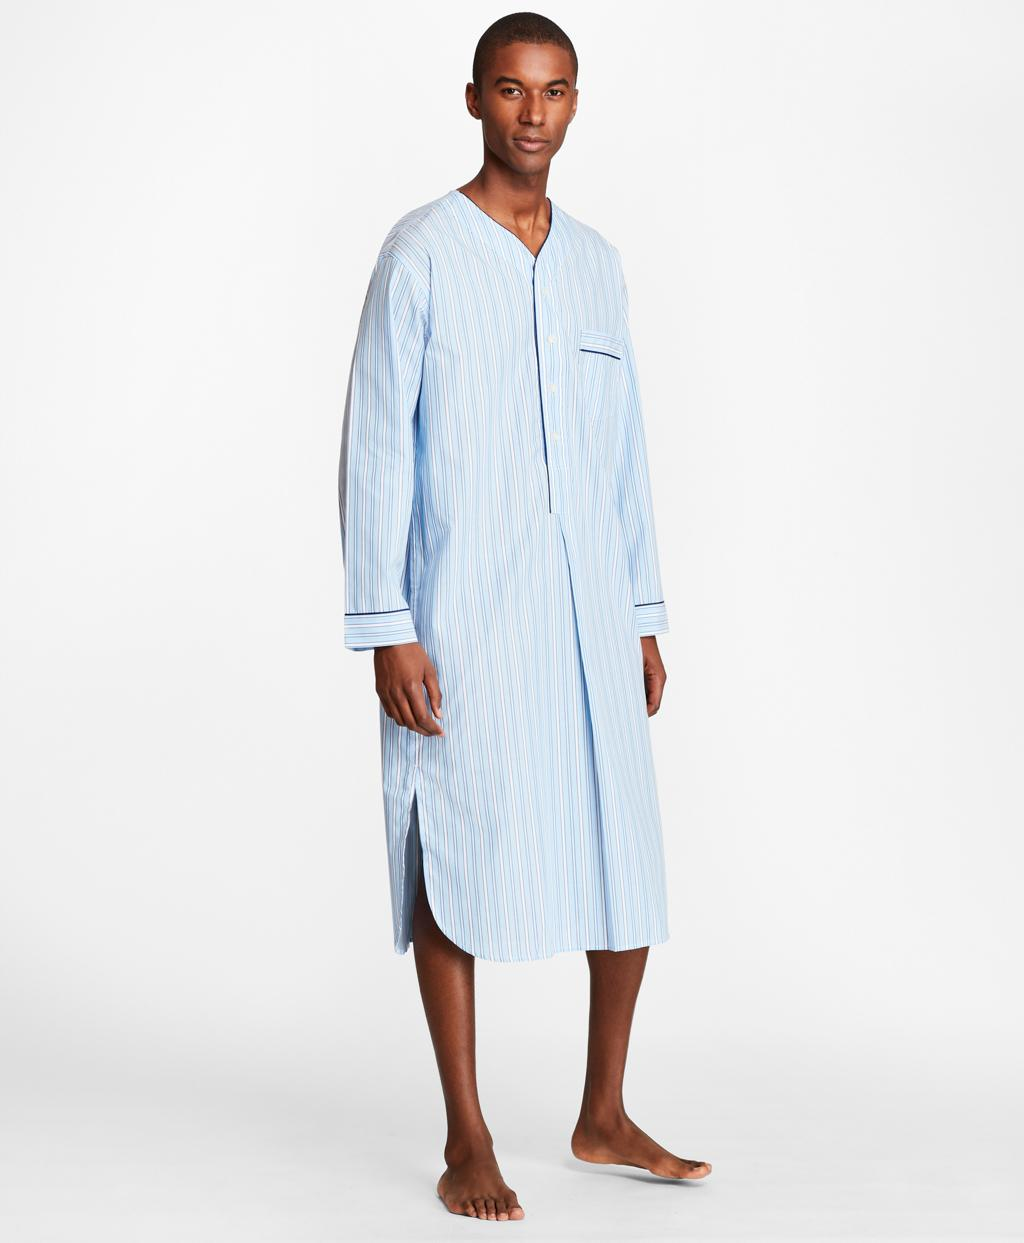 181eb45f60d Mens Extra Long Nightshirts - DREAMWORKS